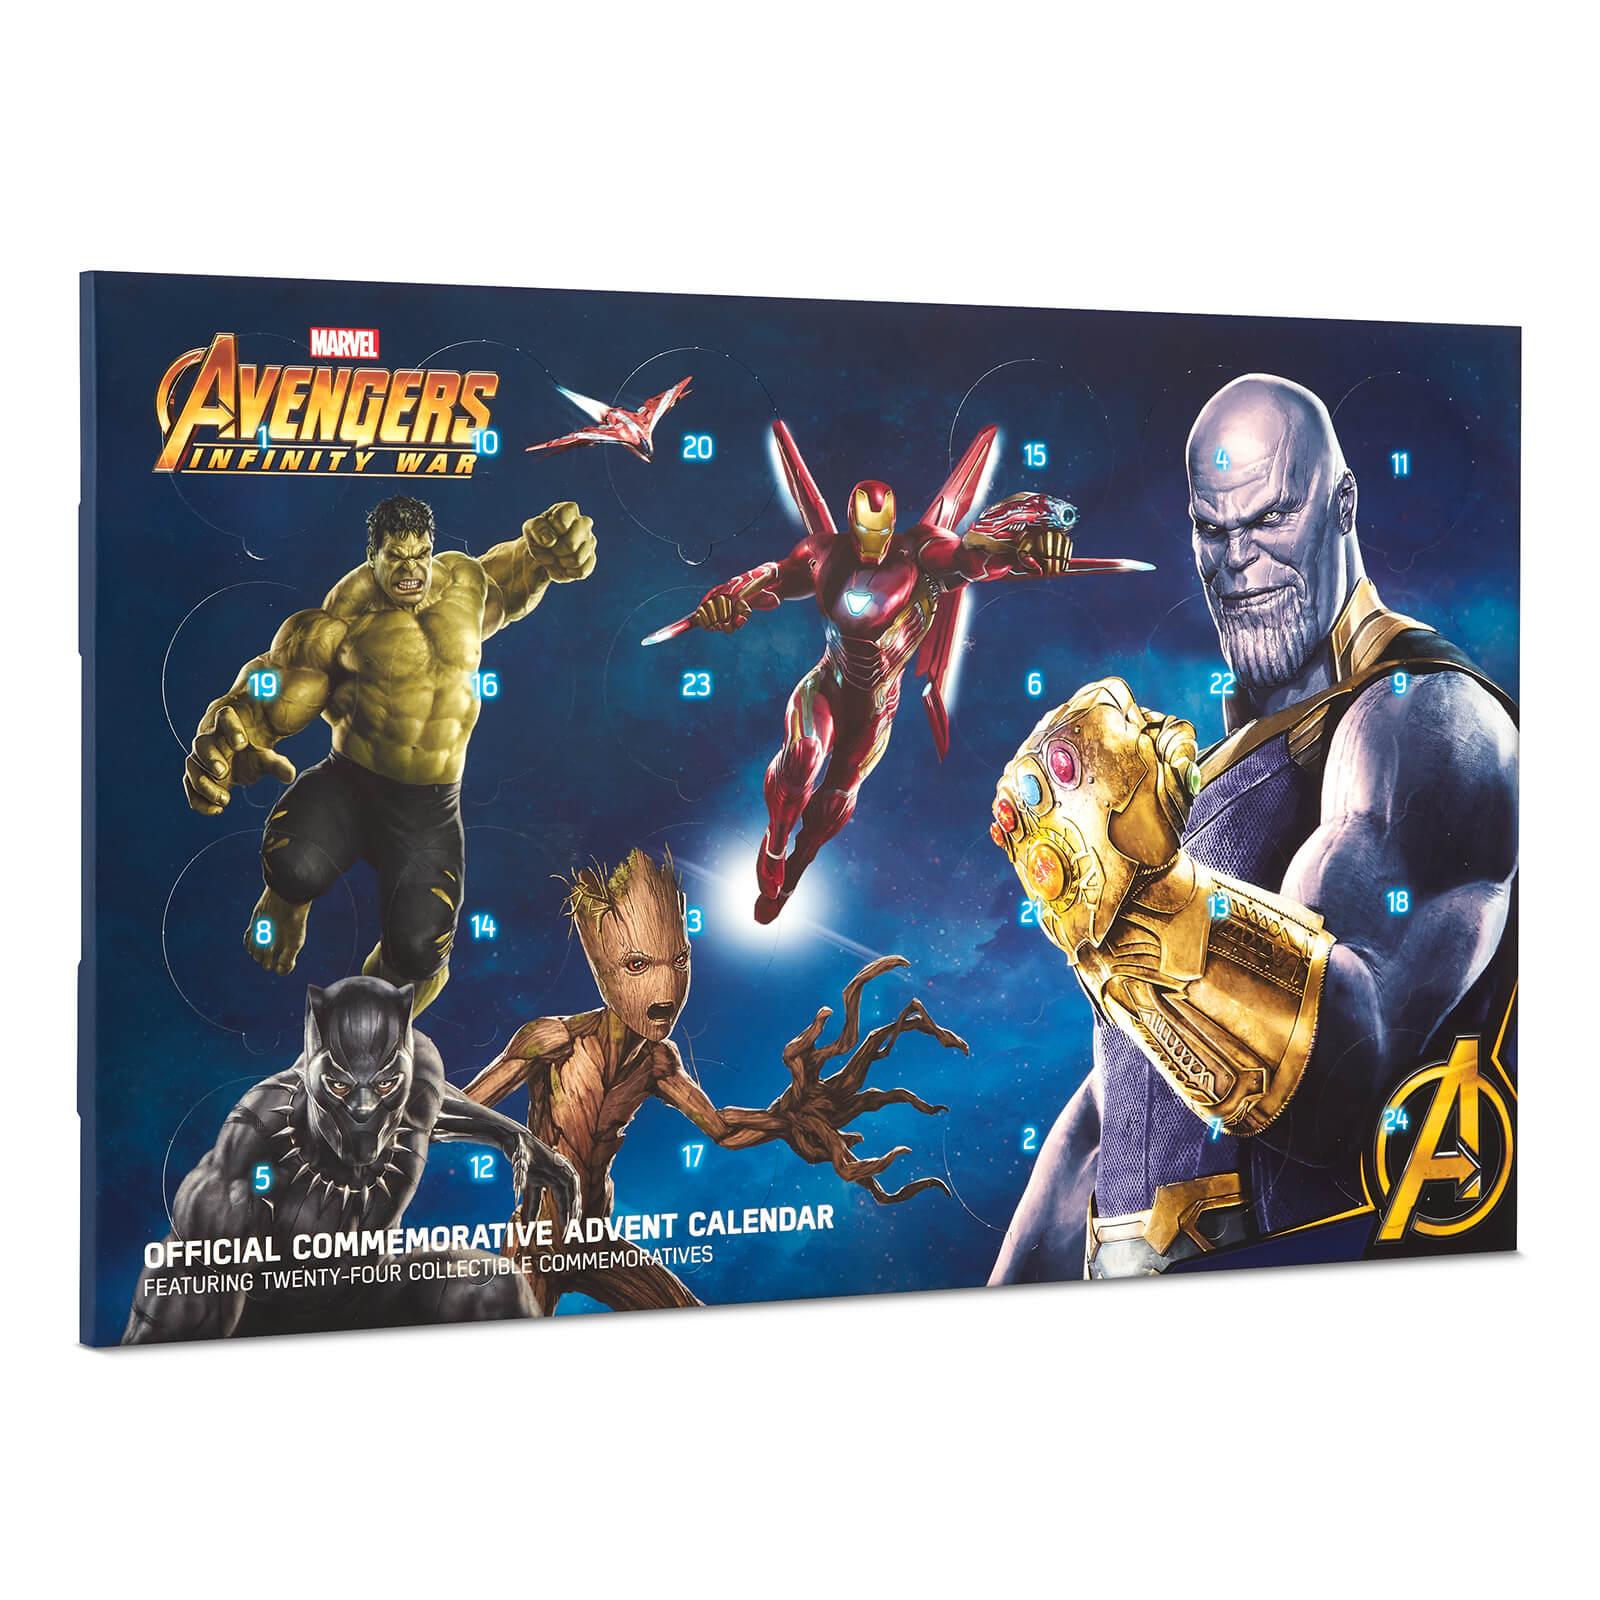 Marvel Calendrier.Calendrier De L Avent Marvel Avengers Infinity War Edition Limitee